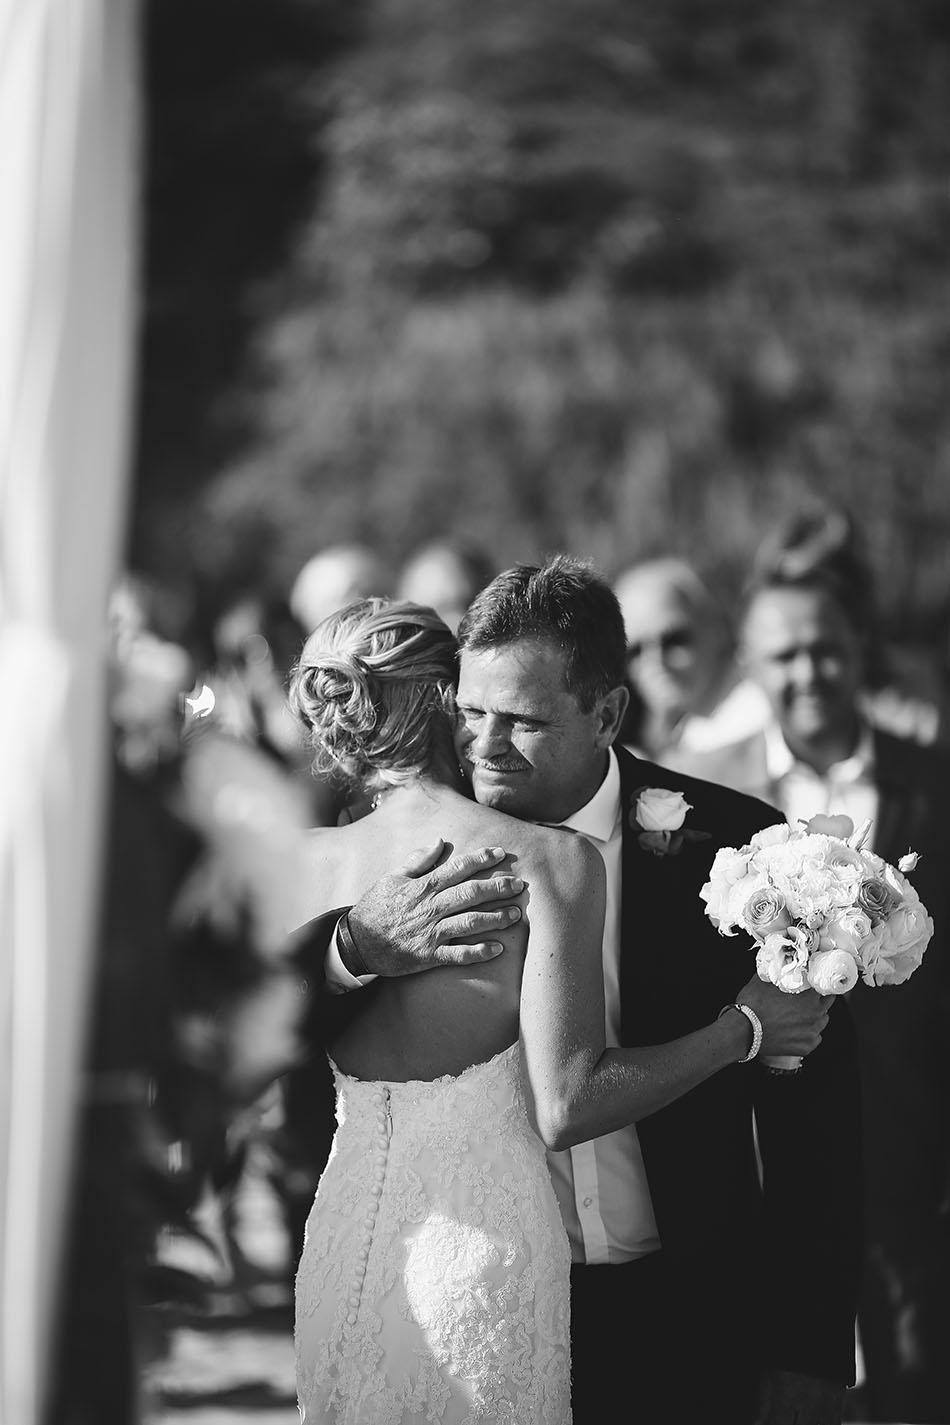 Michelle&Karien -- Married@The Views Botique Hotel&Spa, Wilderness-935